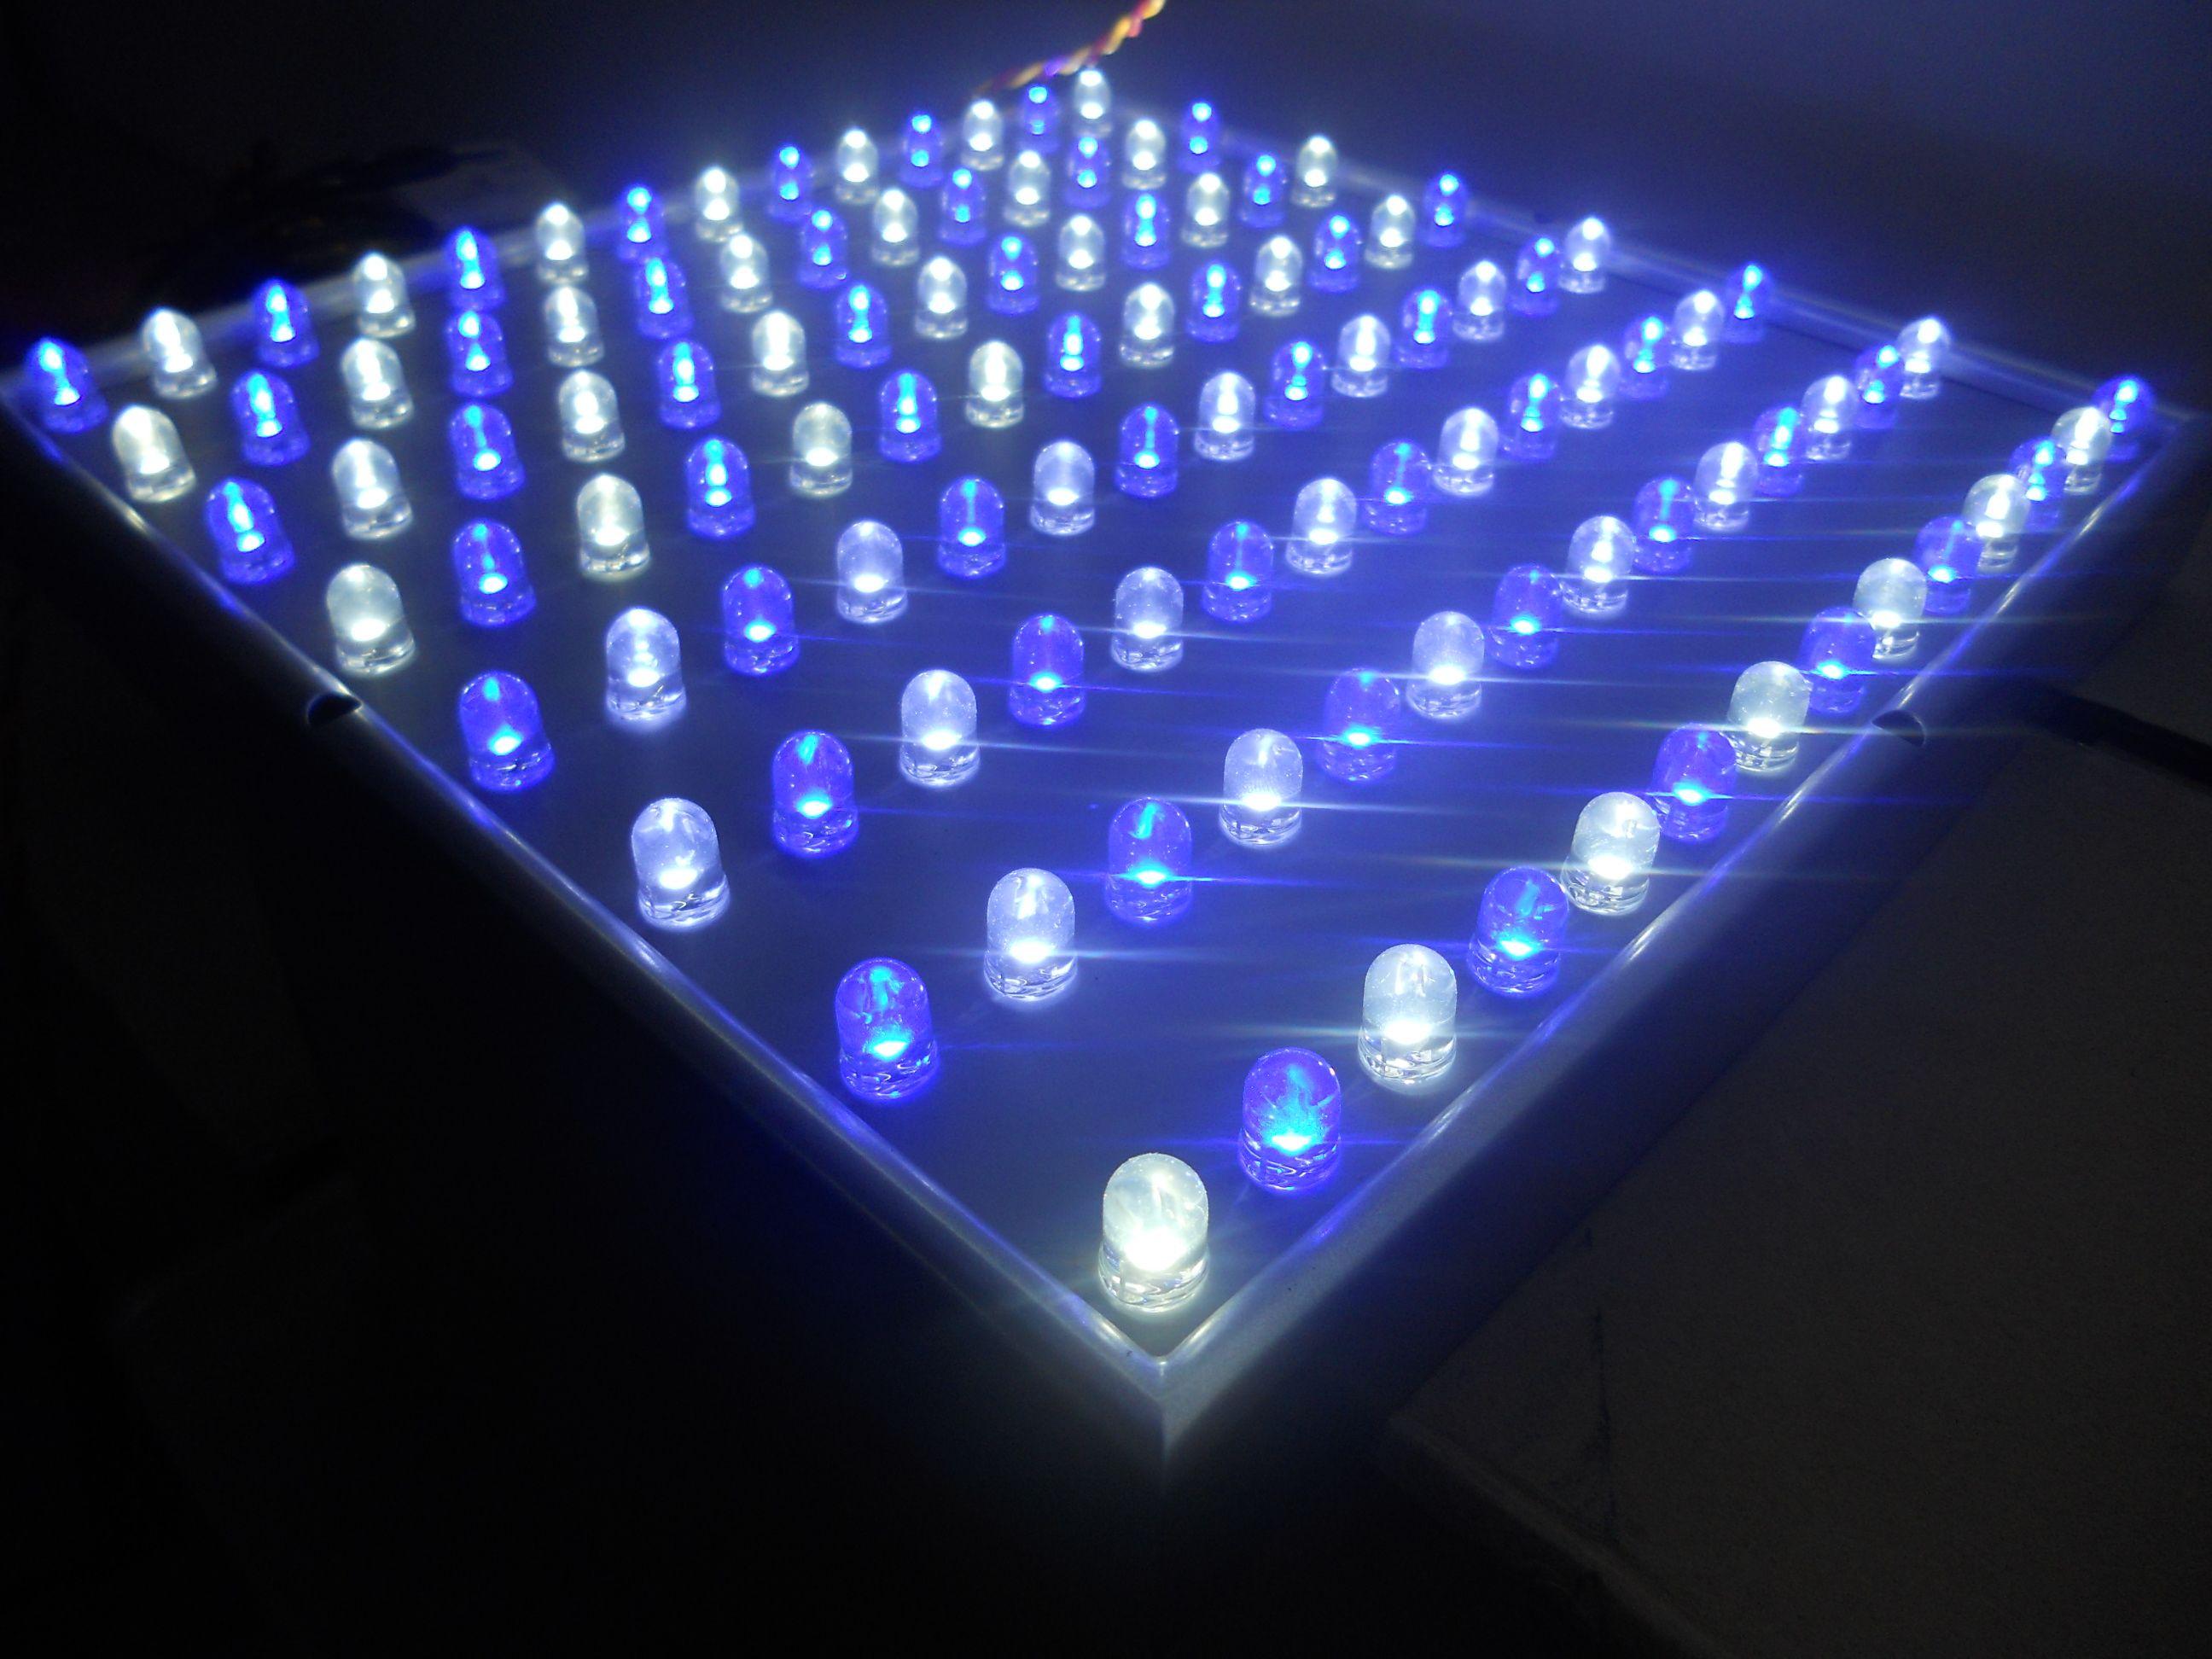 Fish tank led lights - 45w Aquarium Light For Fish 1800lm White Blue Aquarium Led Light Led Tube Cost Lights For Growing Plants Best Indoor Grow Lights From Grenda188